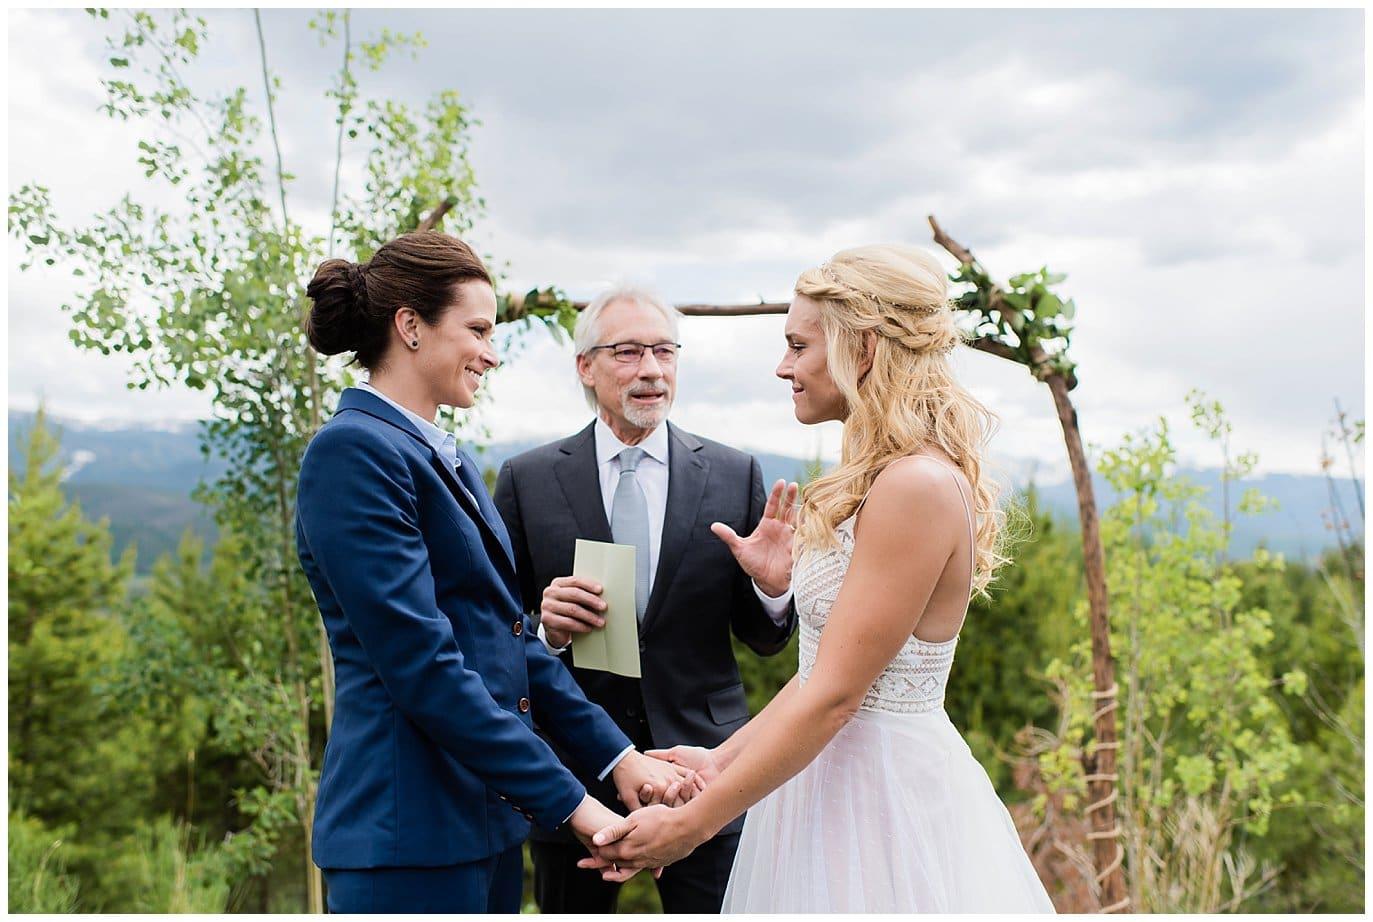 same-sex mountain wedding ceremony photo